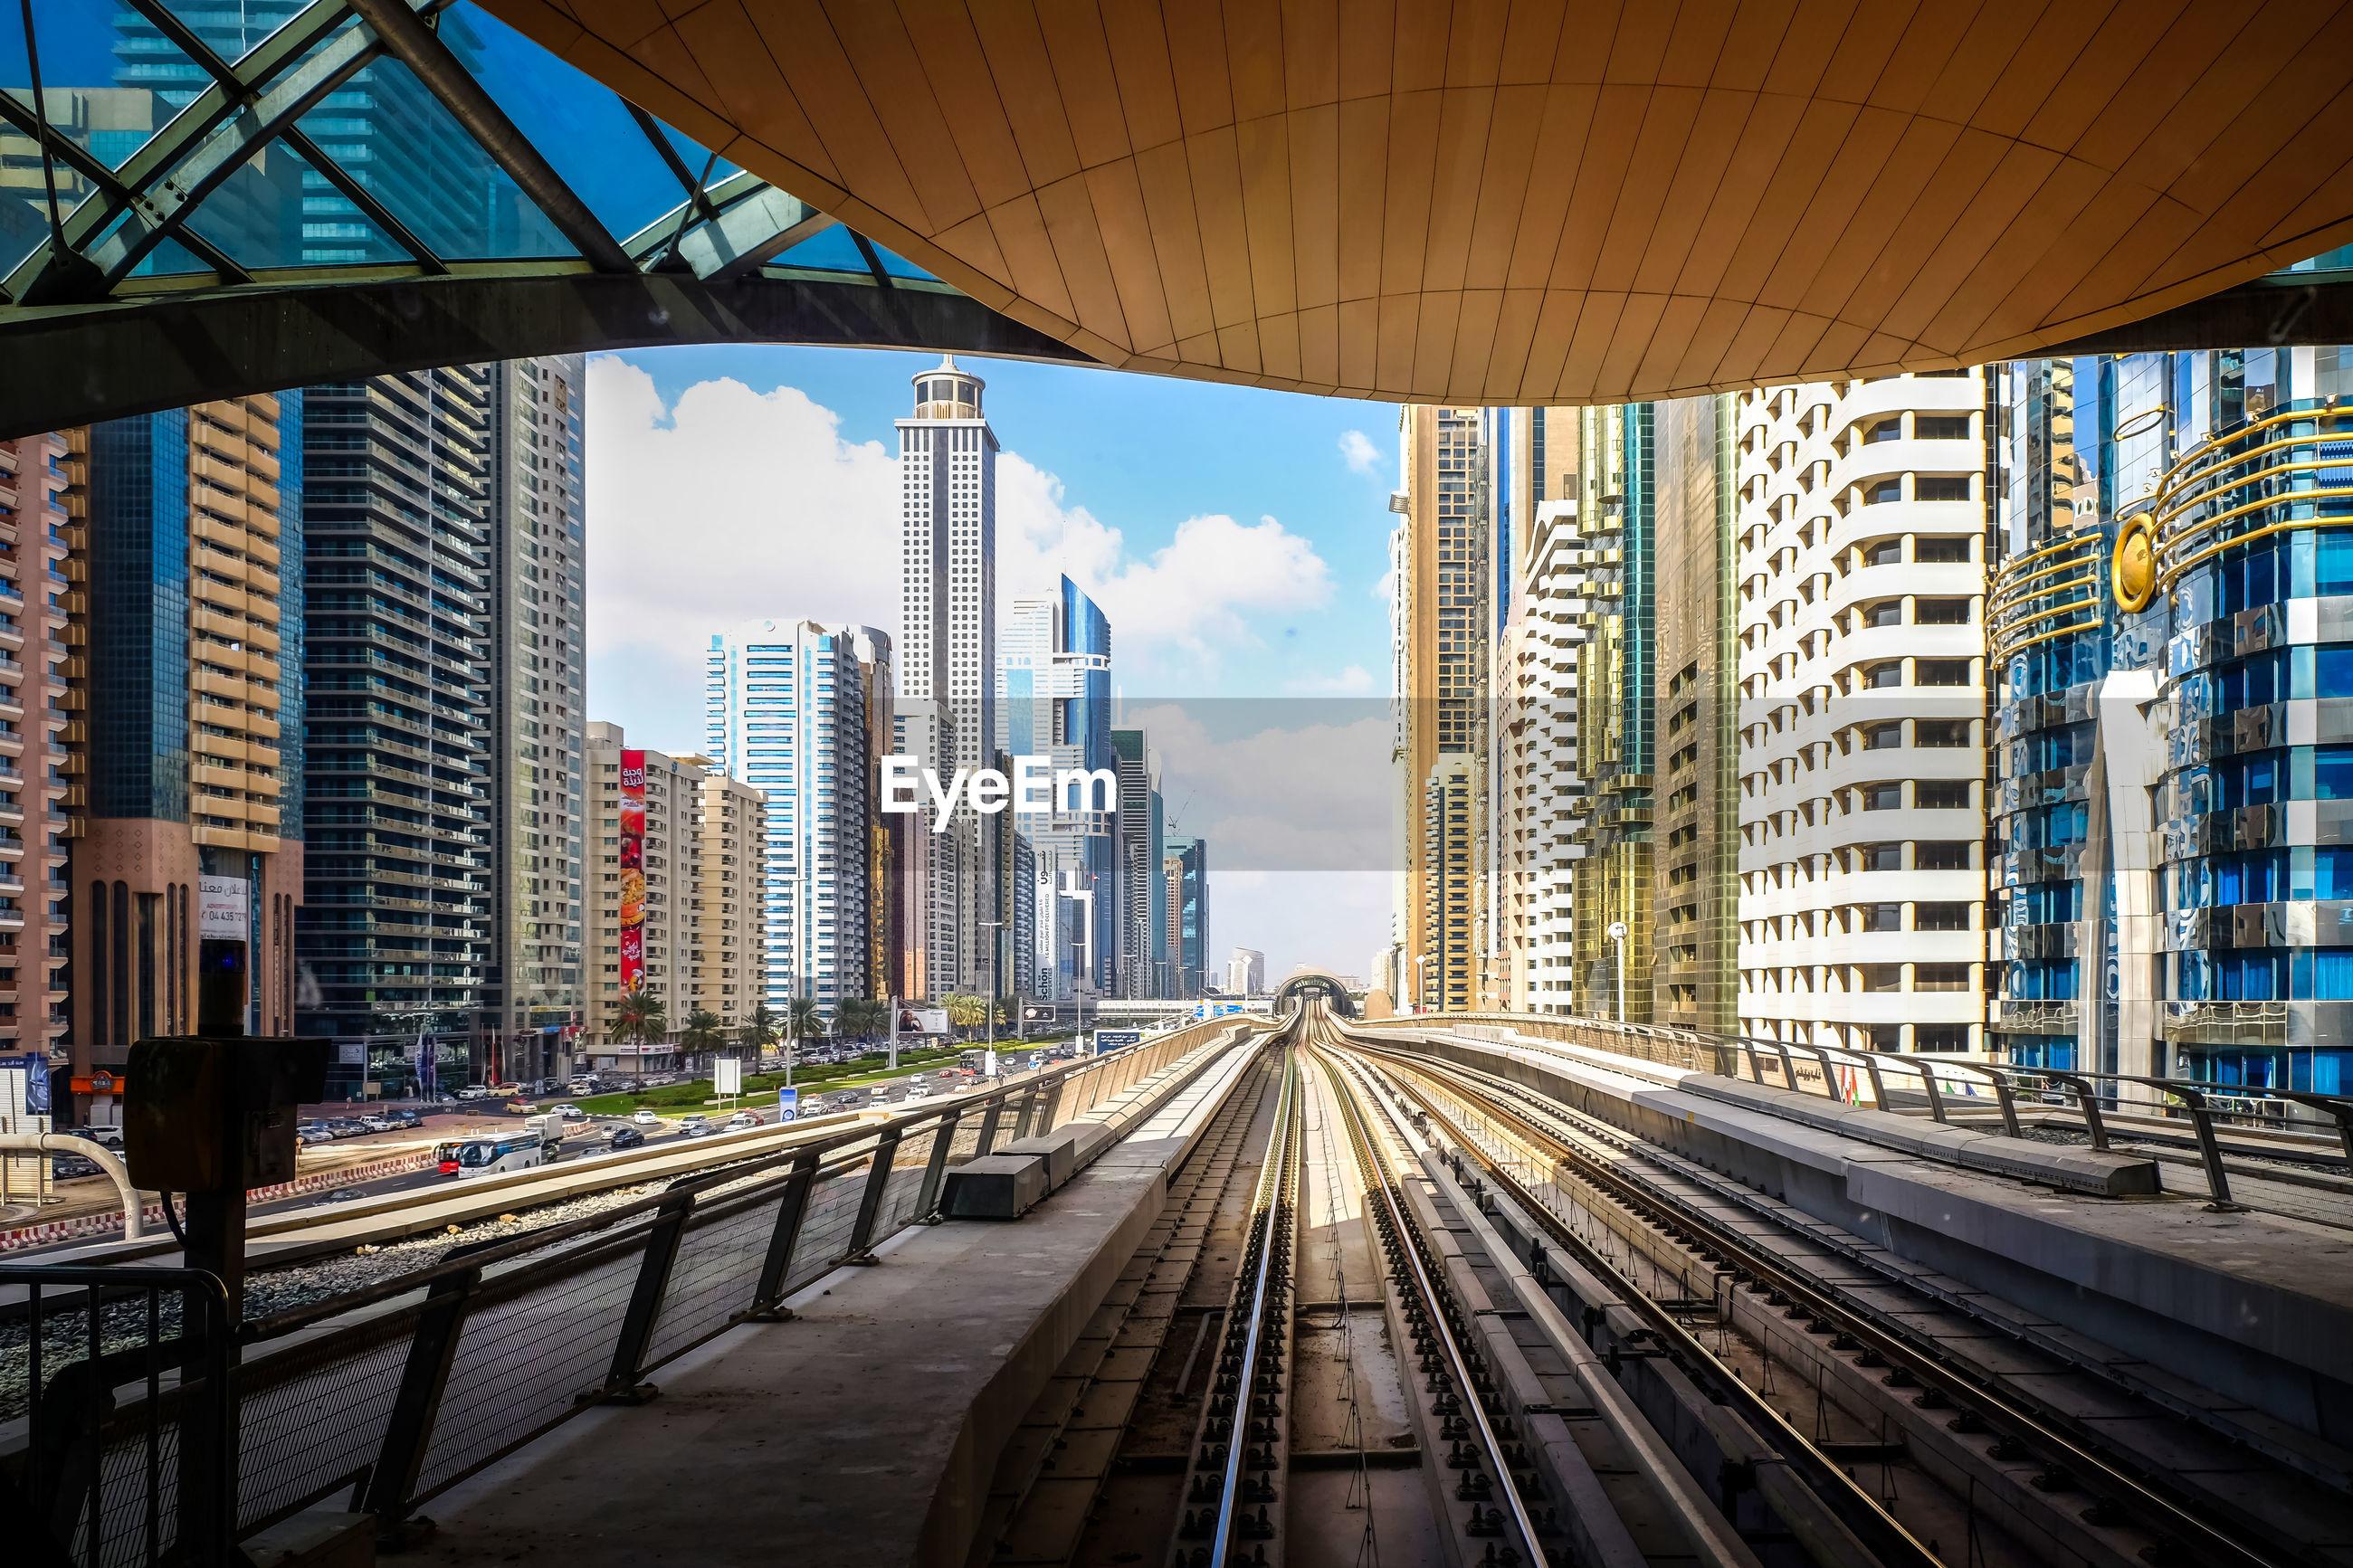 Railroad tracks passing through city buildings